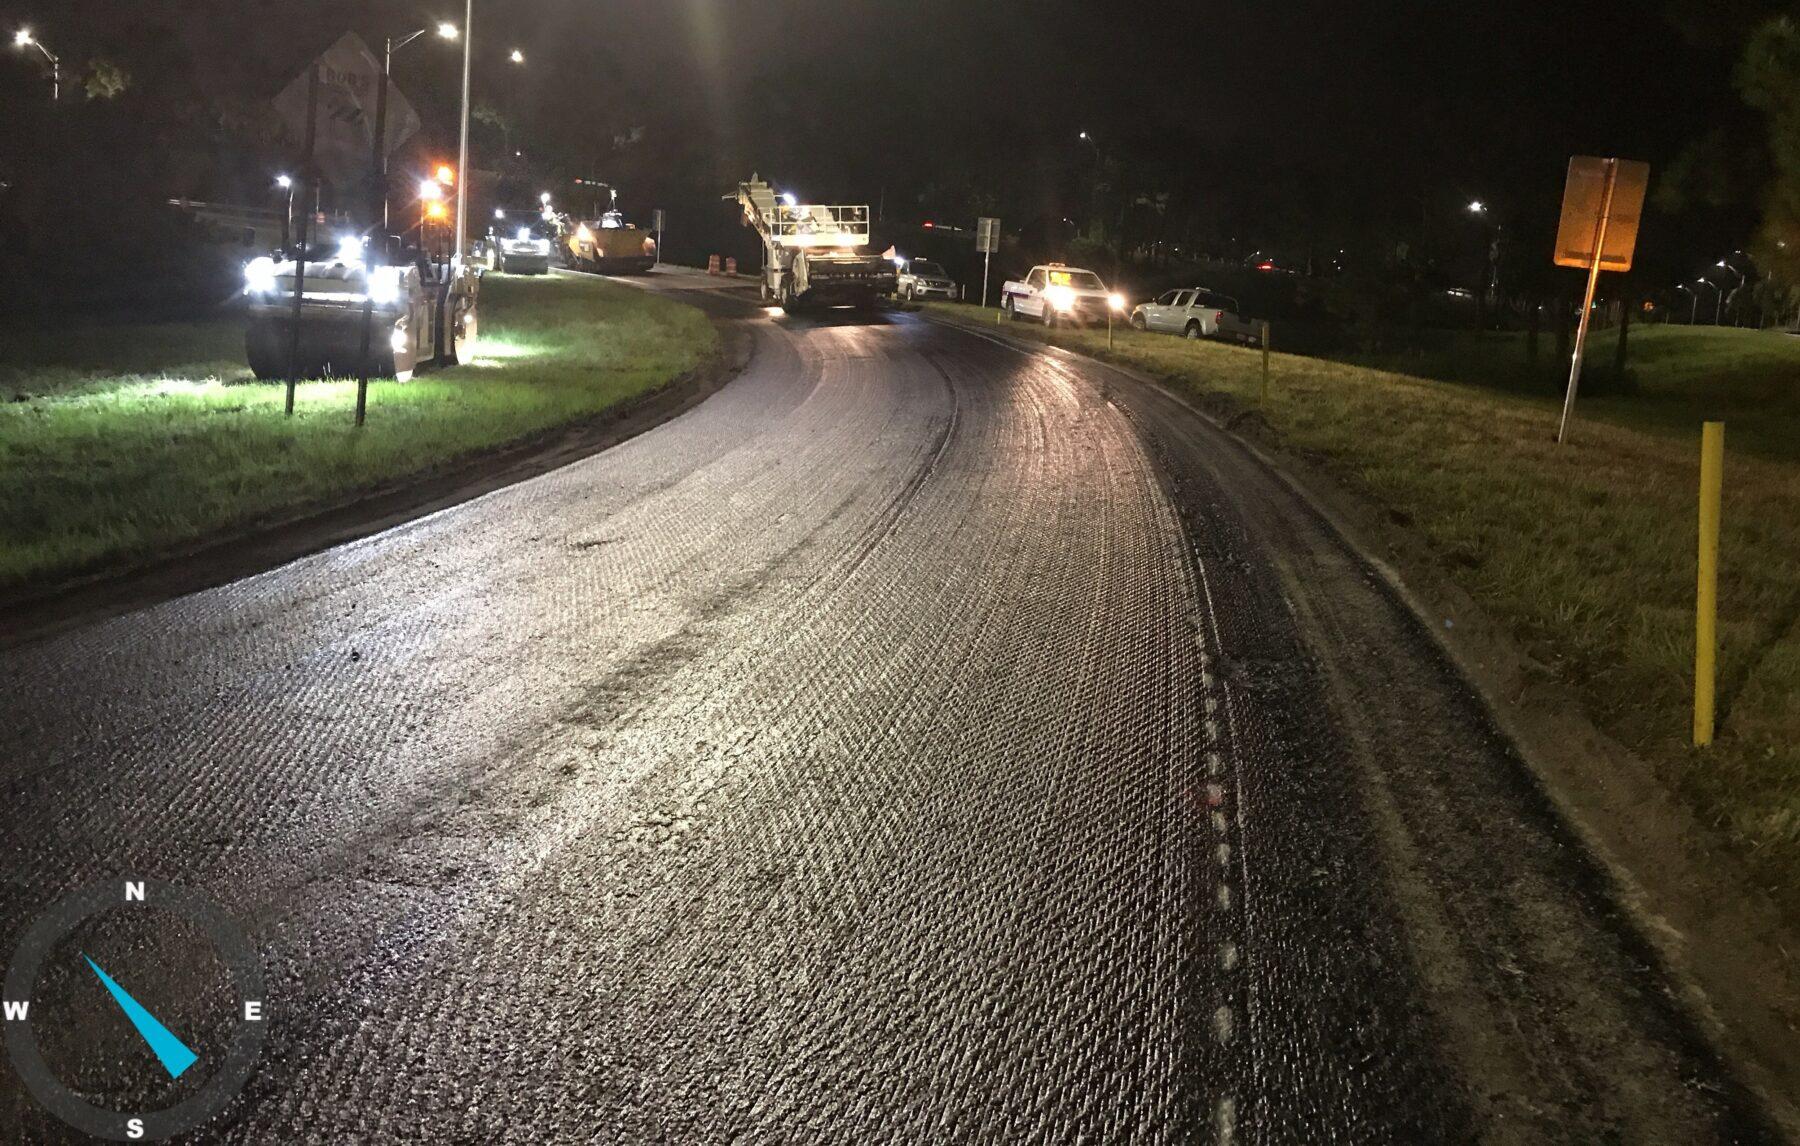 Crews resurfacing State Road 528 over night